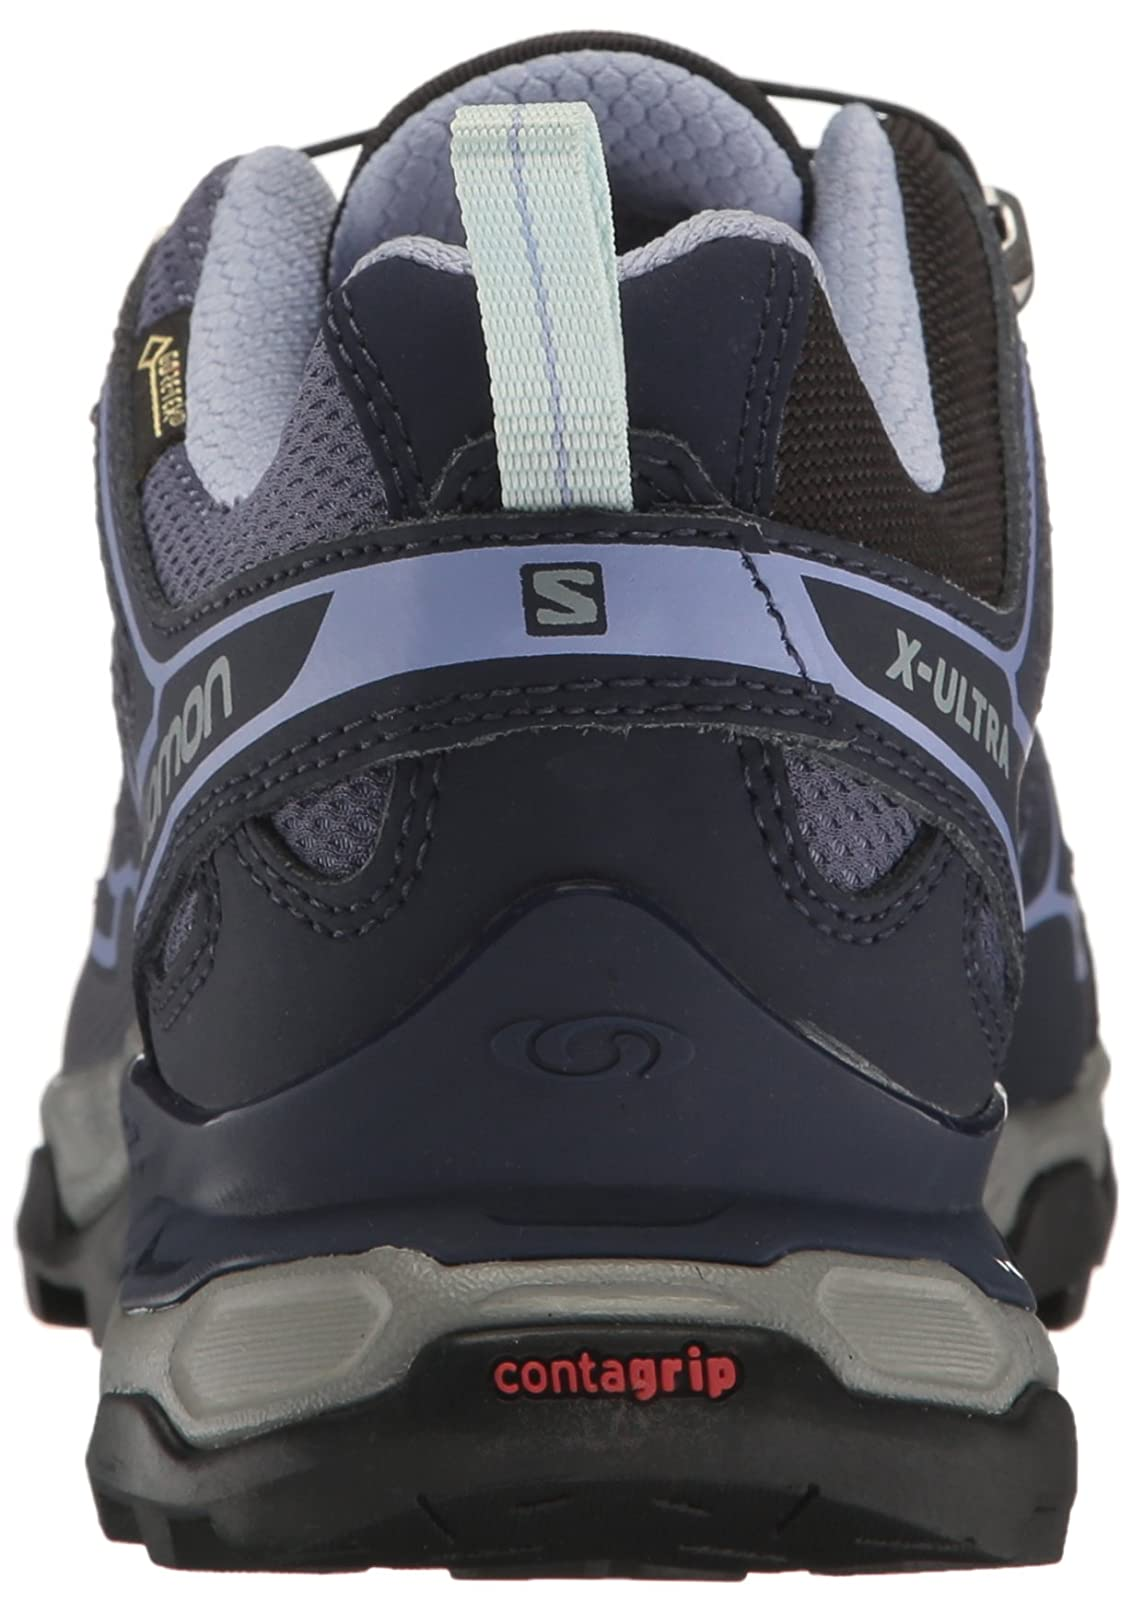 Salomon Women's X Ultra 2 GTX W Hiking Shoe 7 M US - 2